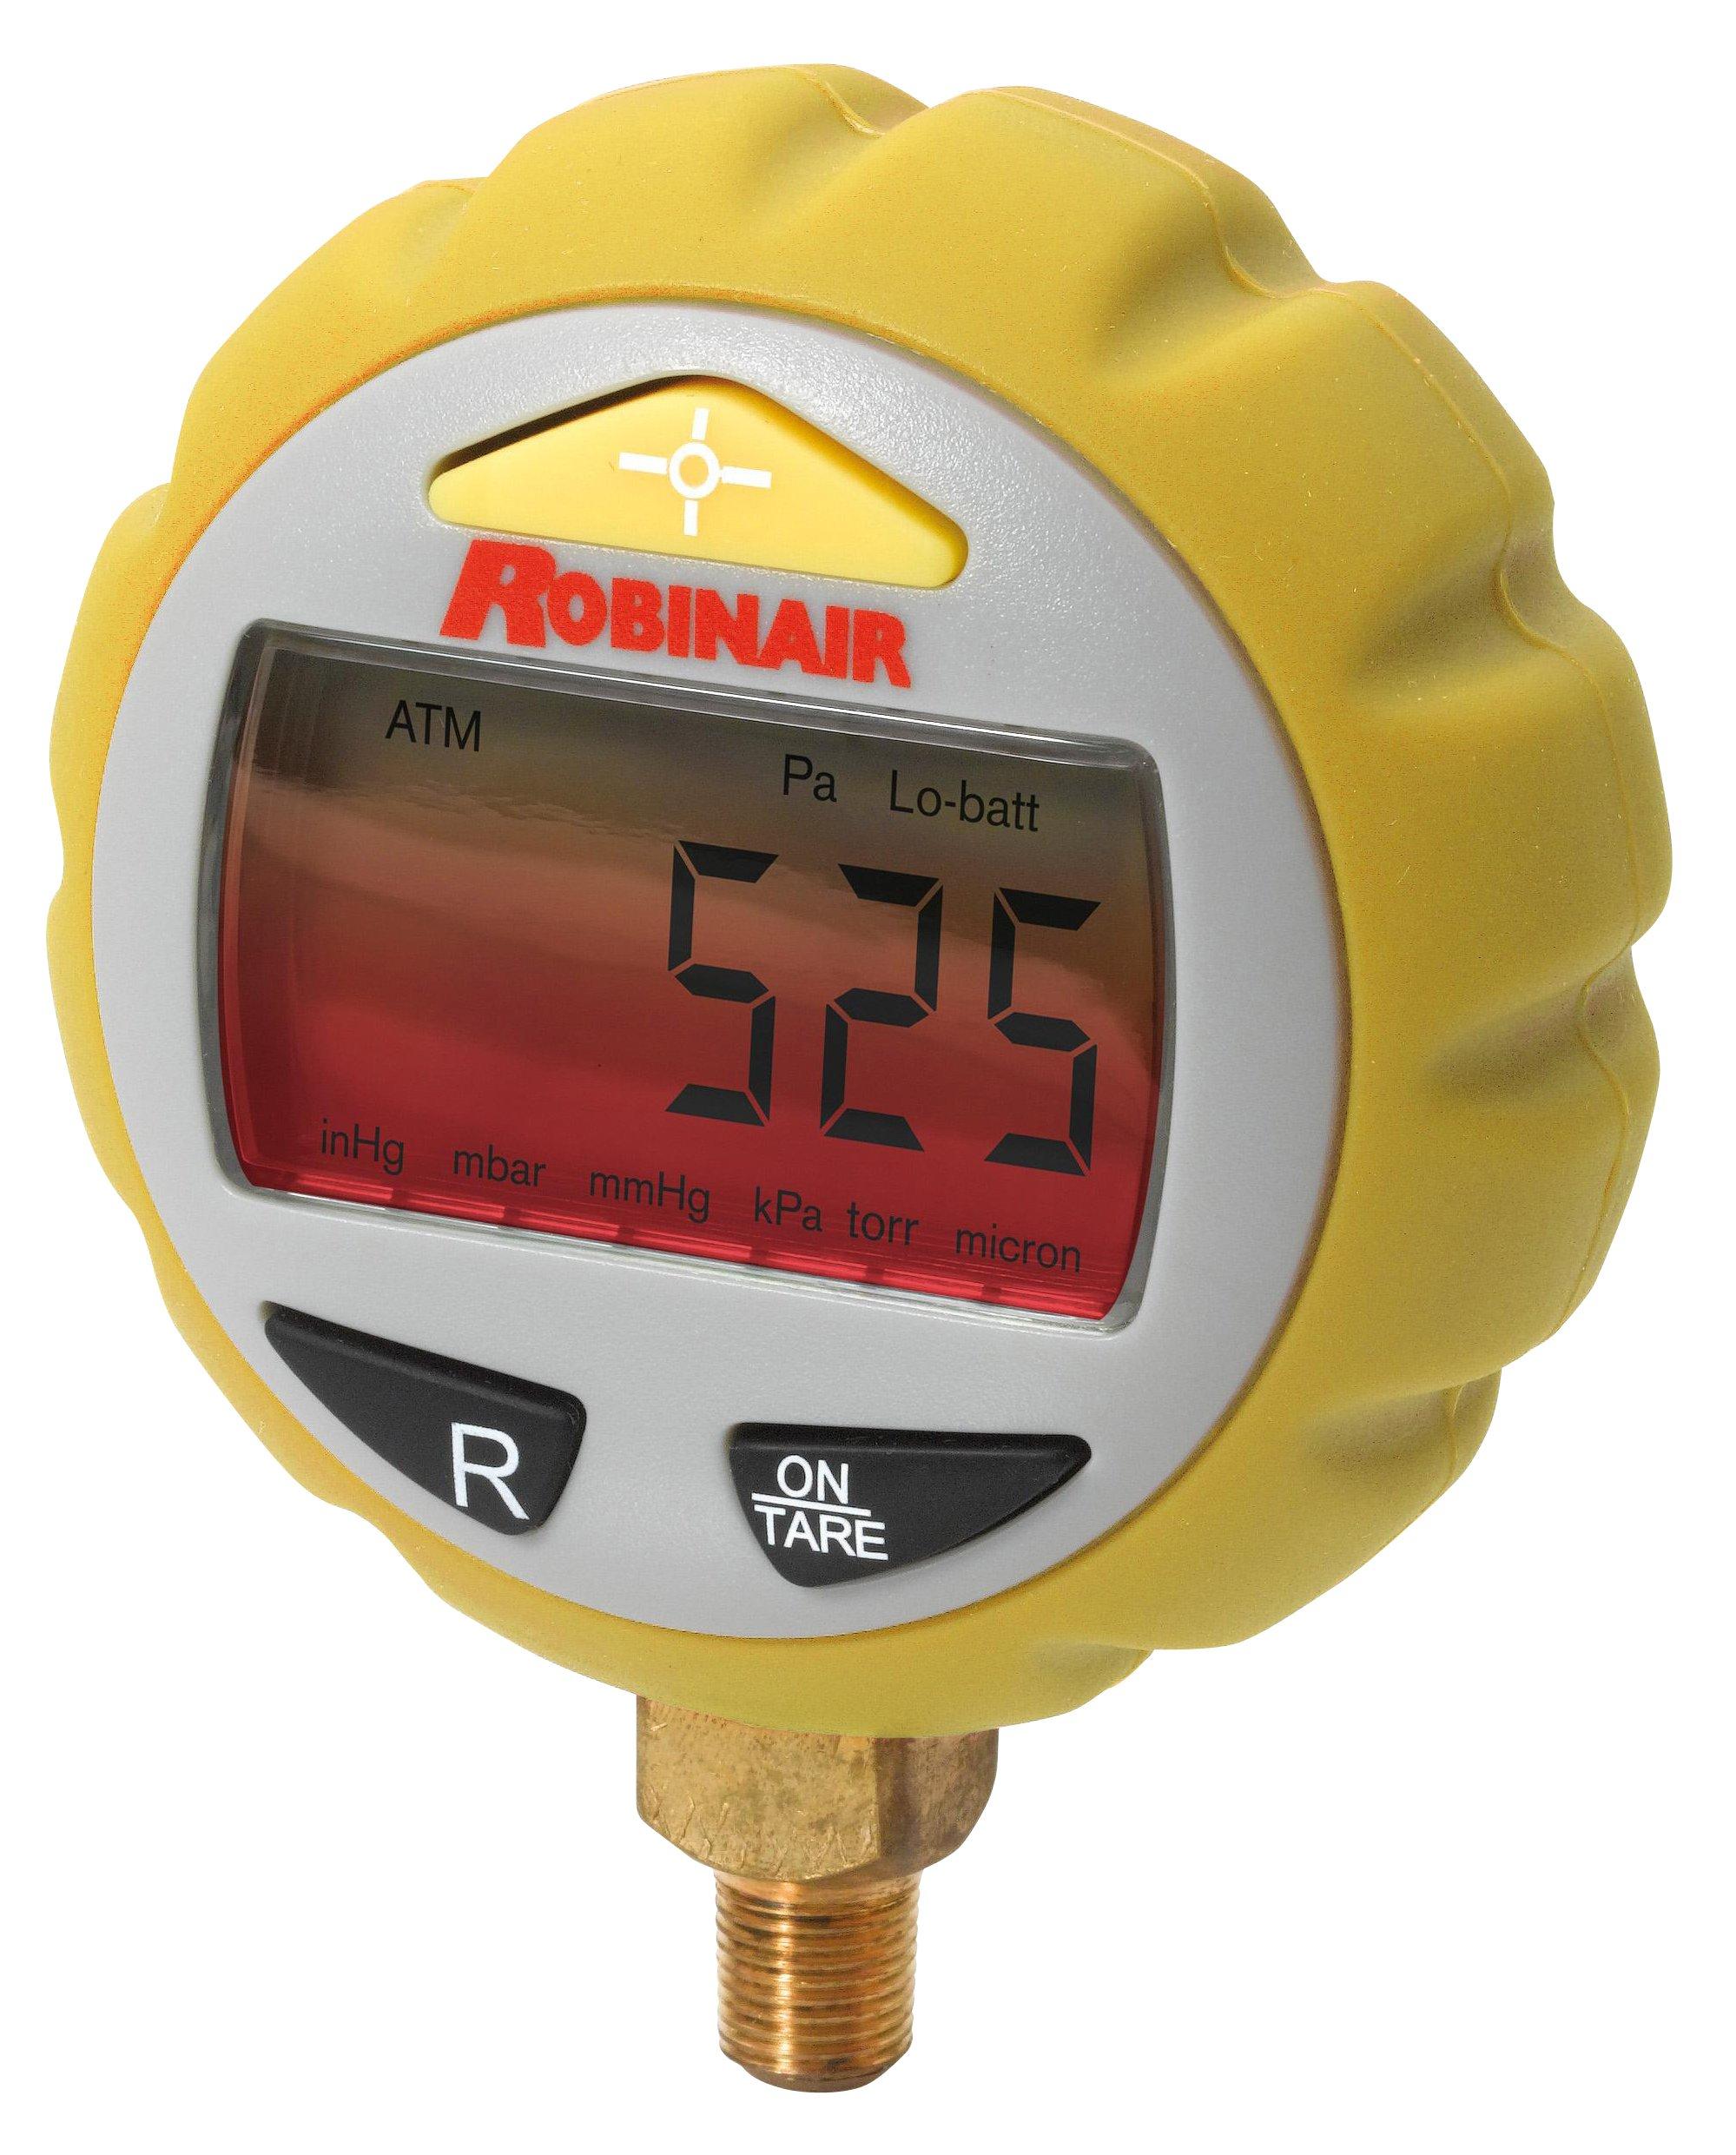 Robinair RAVG-1 Digital Micron Vacuum Gauge by Robinair